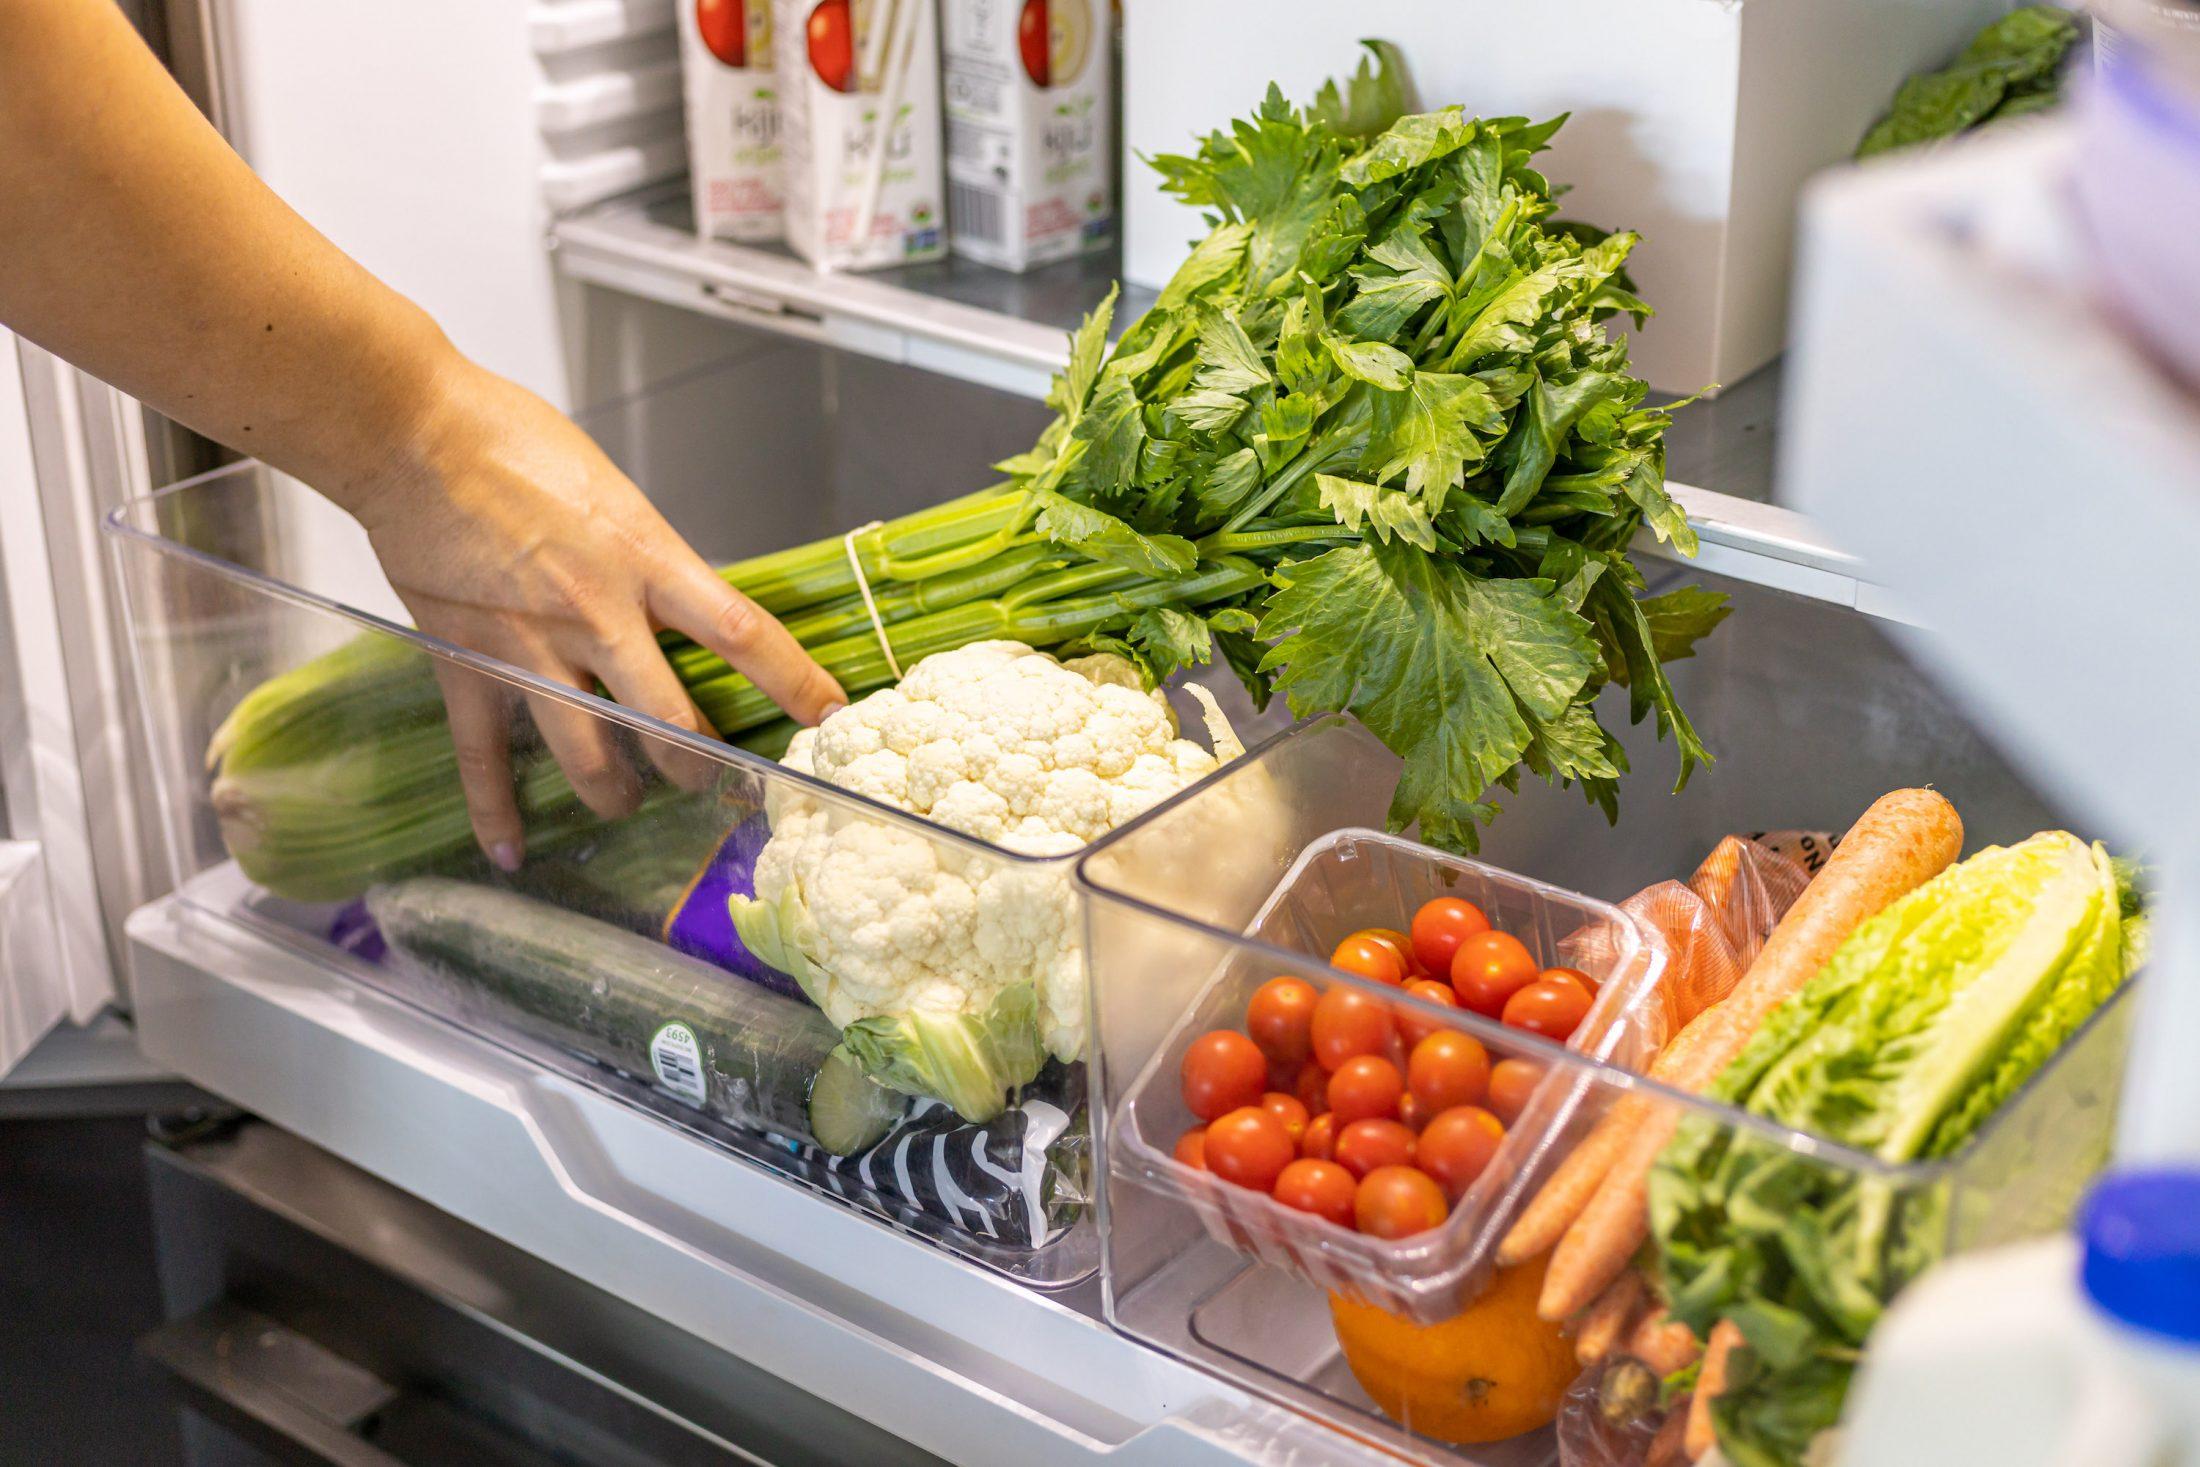 Woman grabs SPUD groceries from her fridge